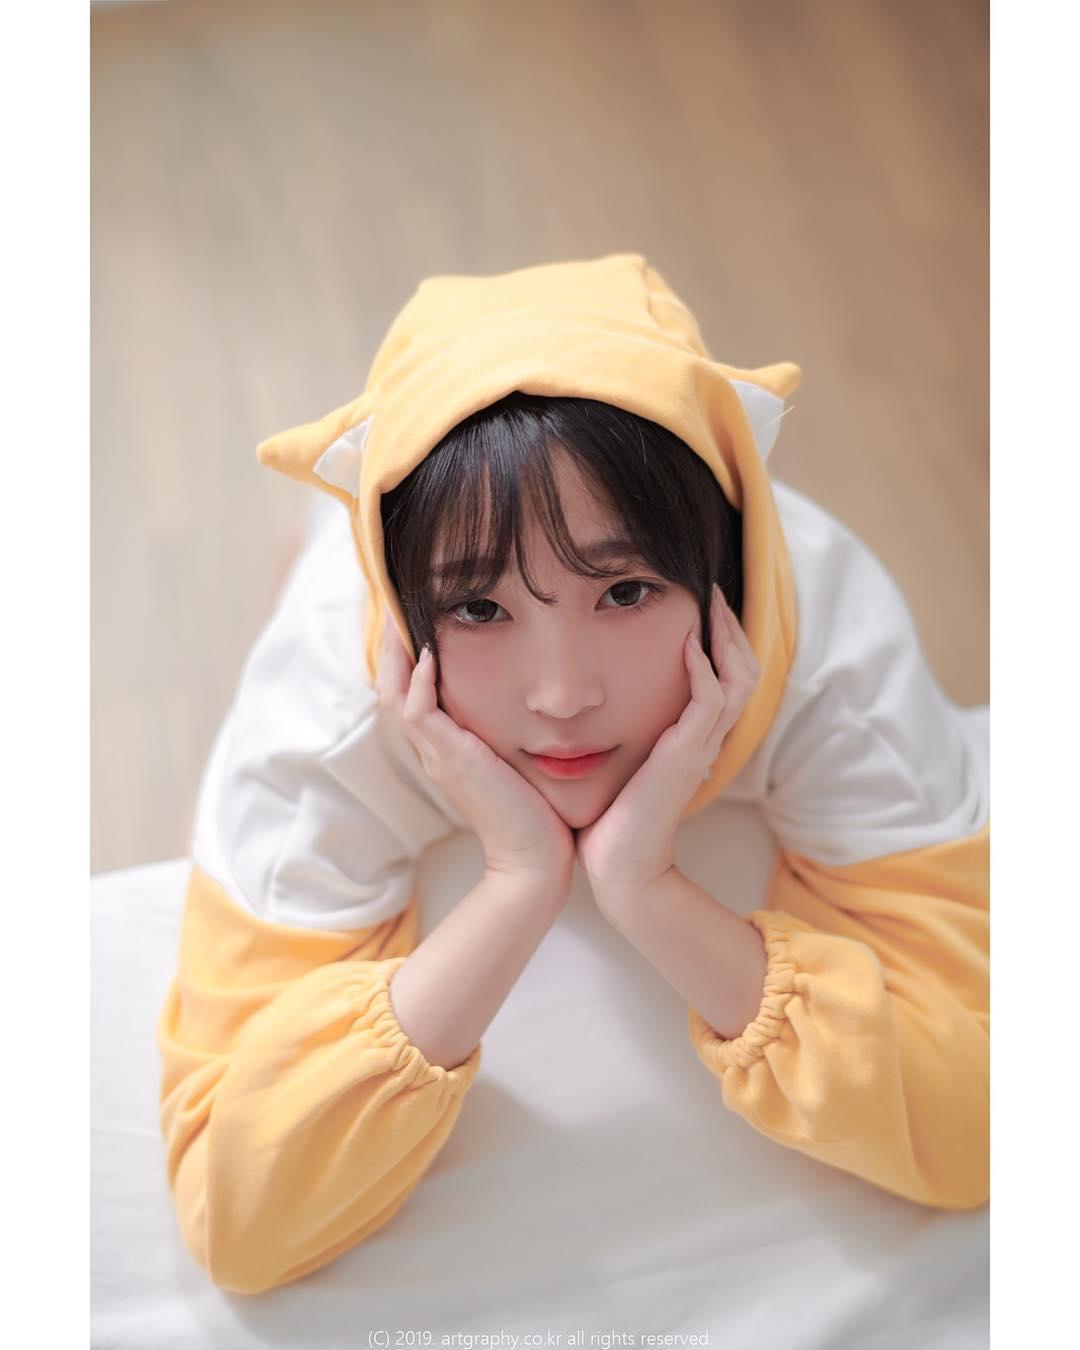 Cosplay 杂图 inkyung97_2021-03-035